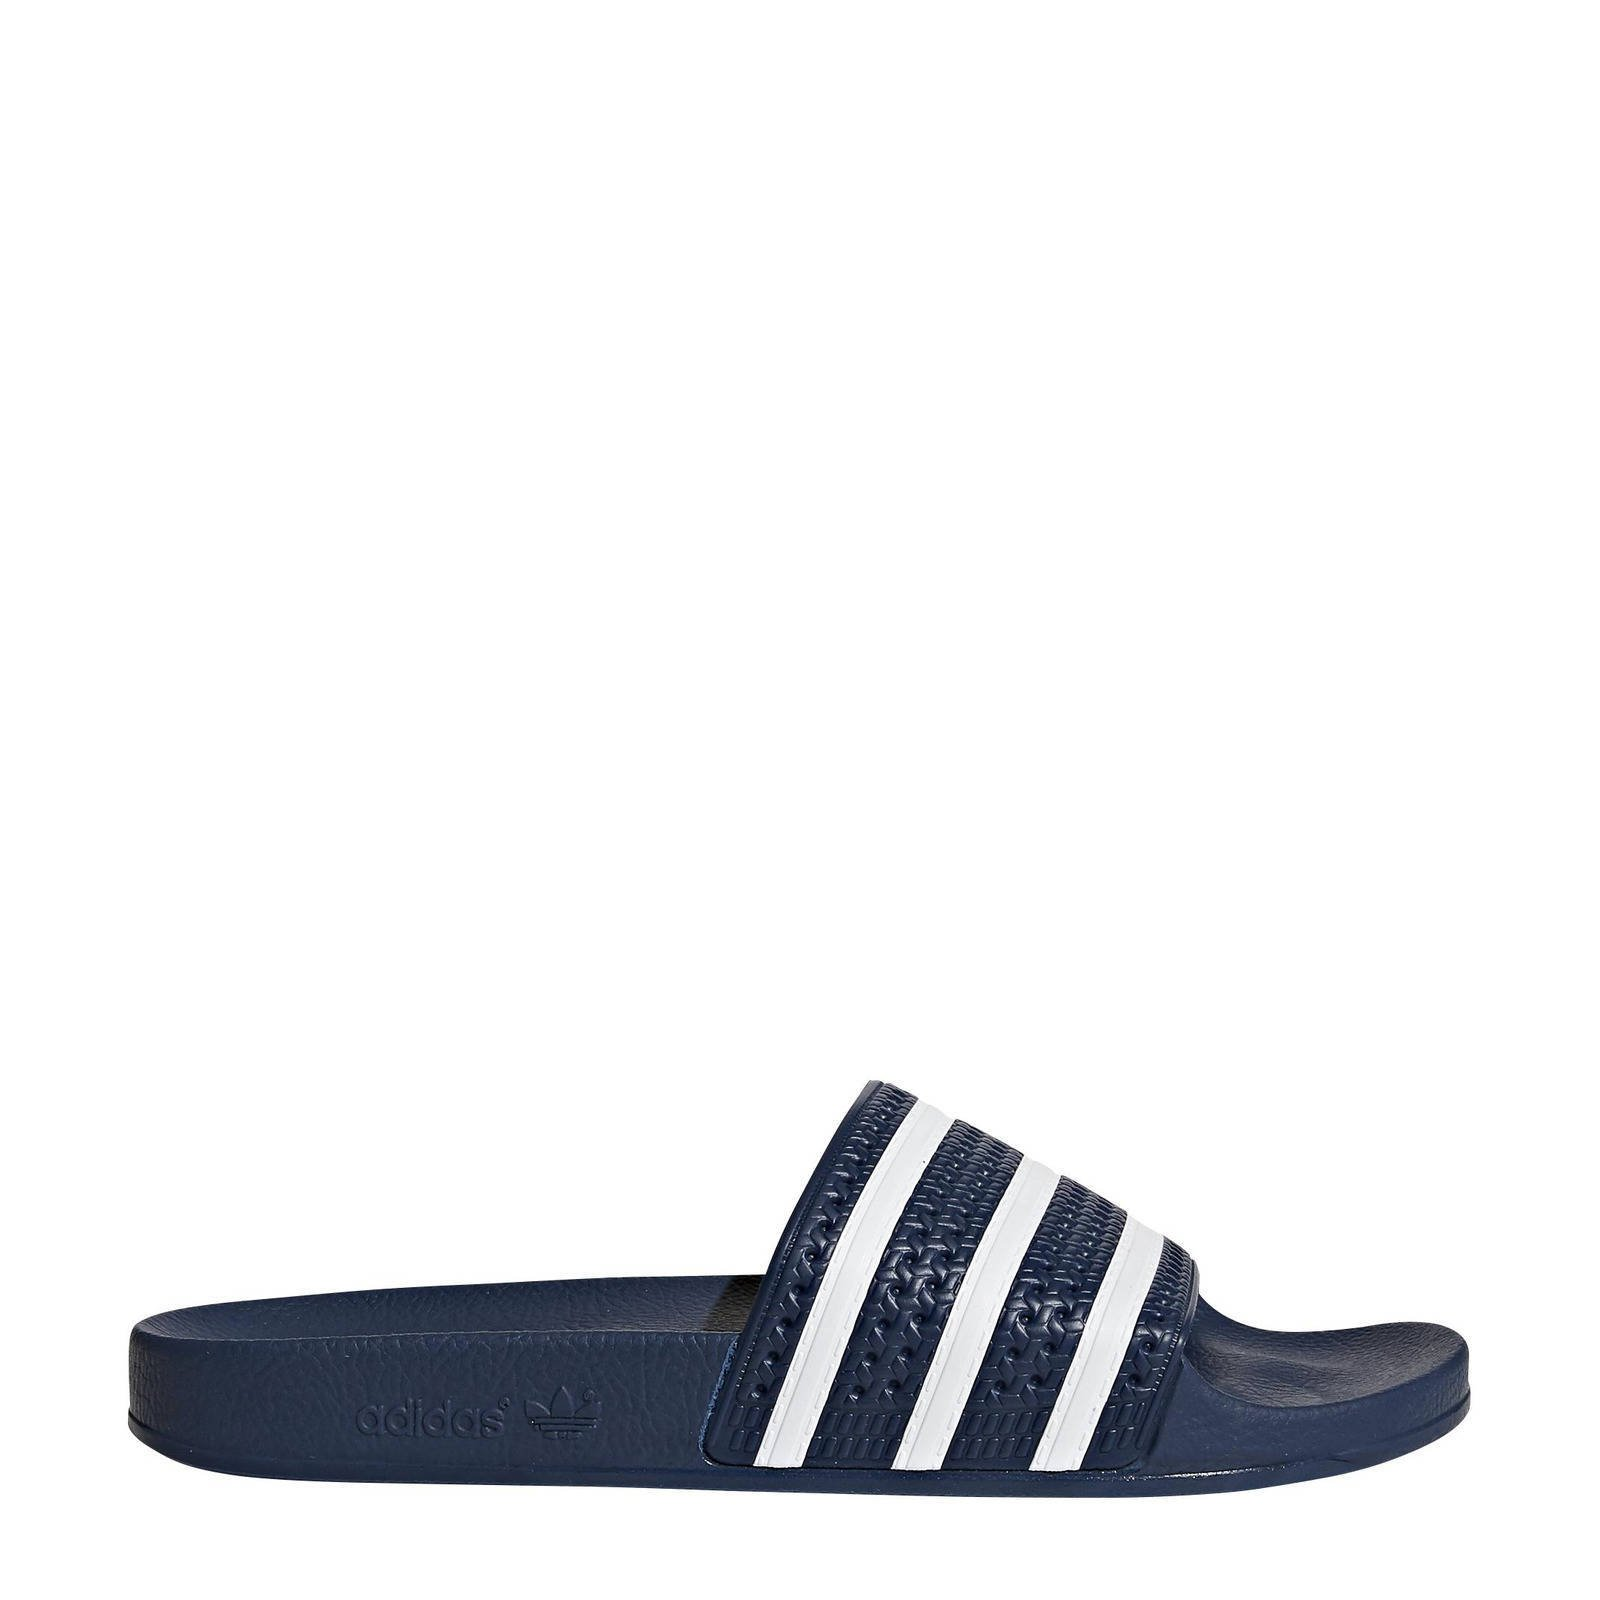 adidas Originals Adilette badslippers donkerblauw | wehkamp